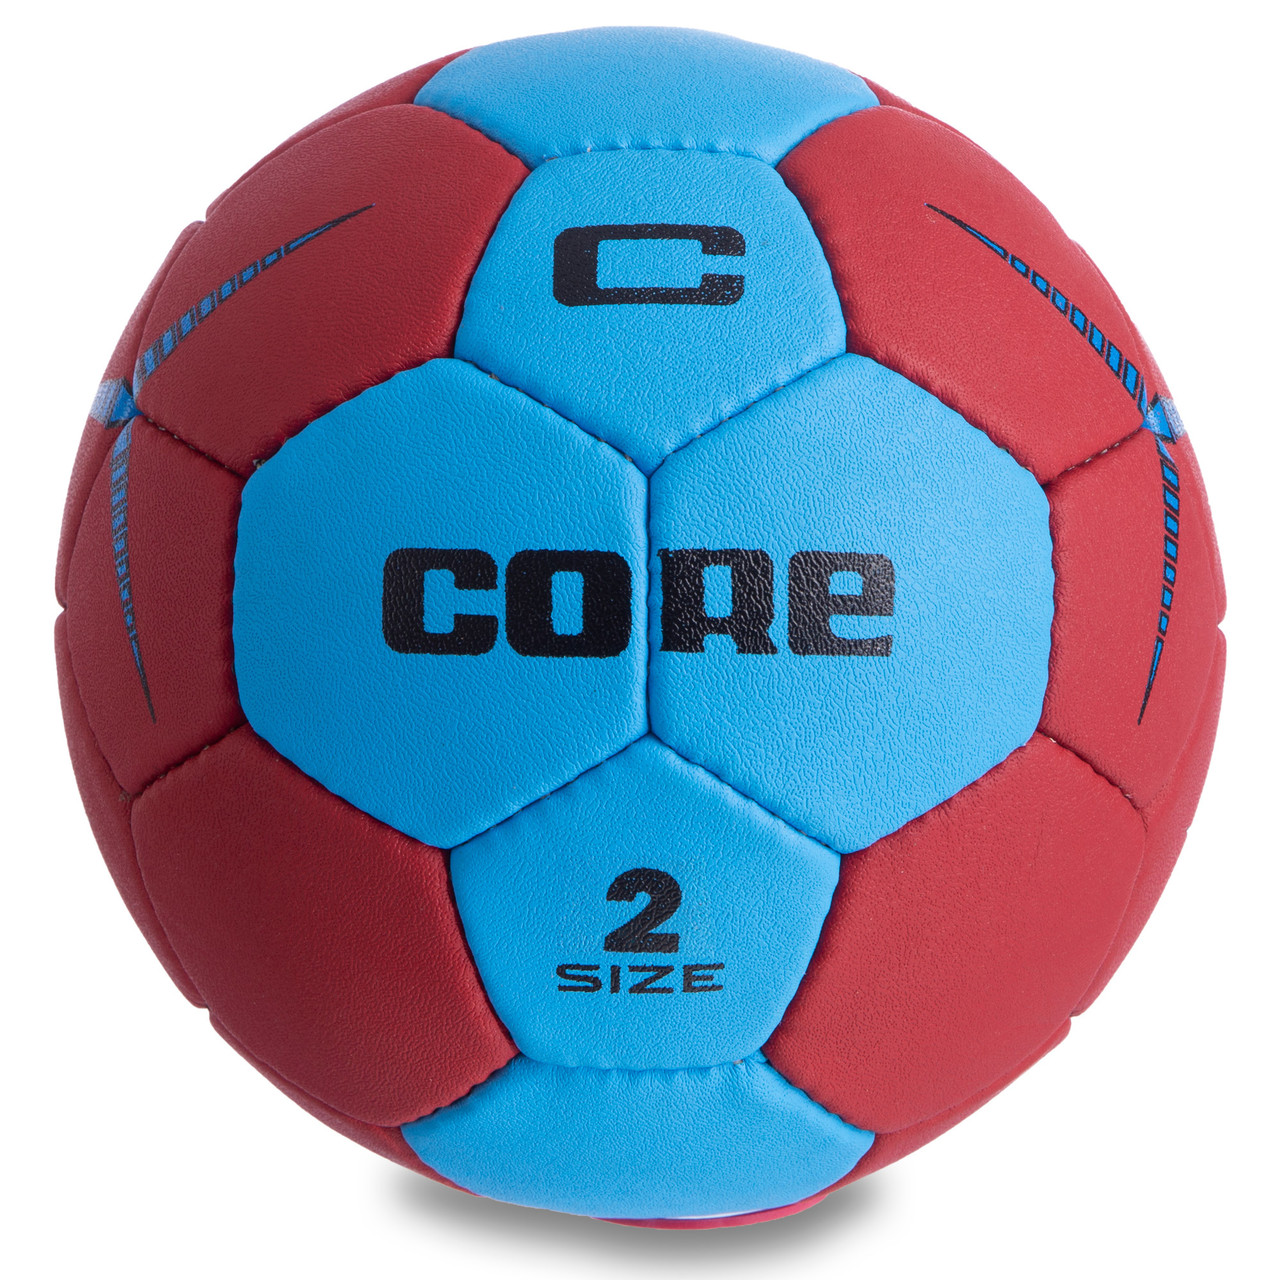 Мяч для гандбола CORE PLAY STREAM CRH-050-2 (PU, р-р 2, сшит вручную, синий-красный)